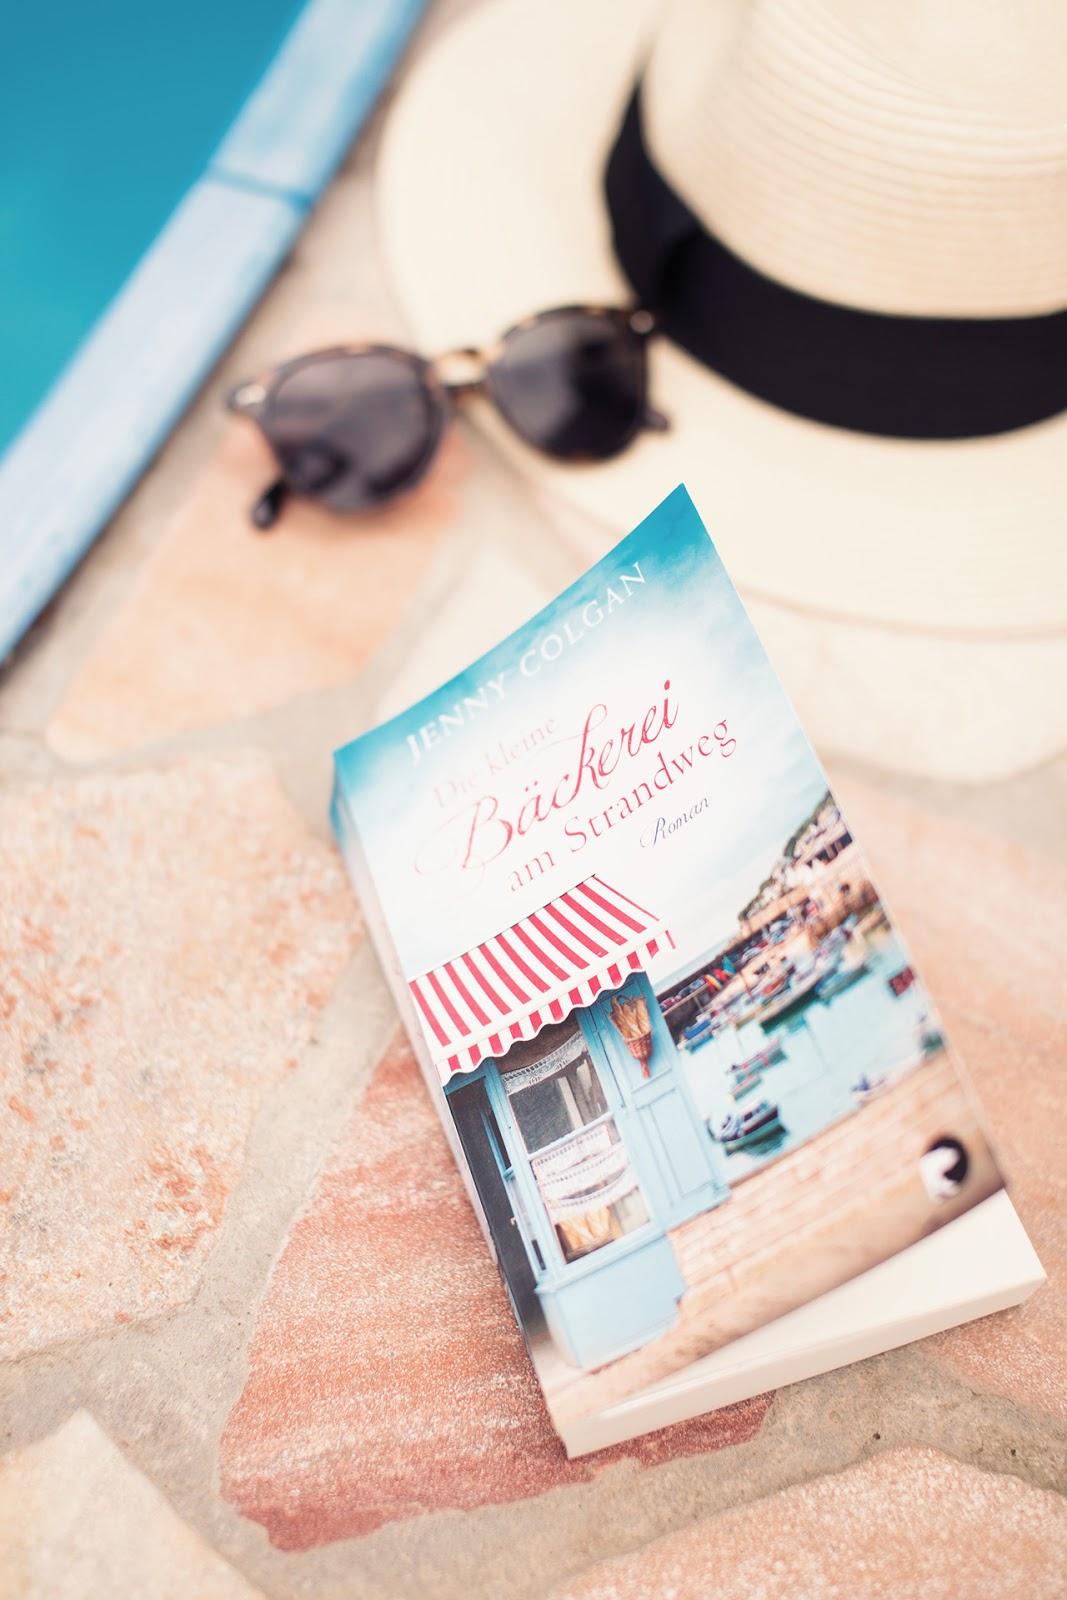 Around The World With Boux The Mandarine Girl Bloglovin